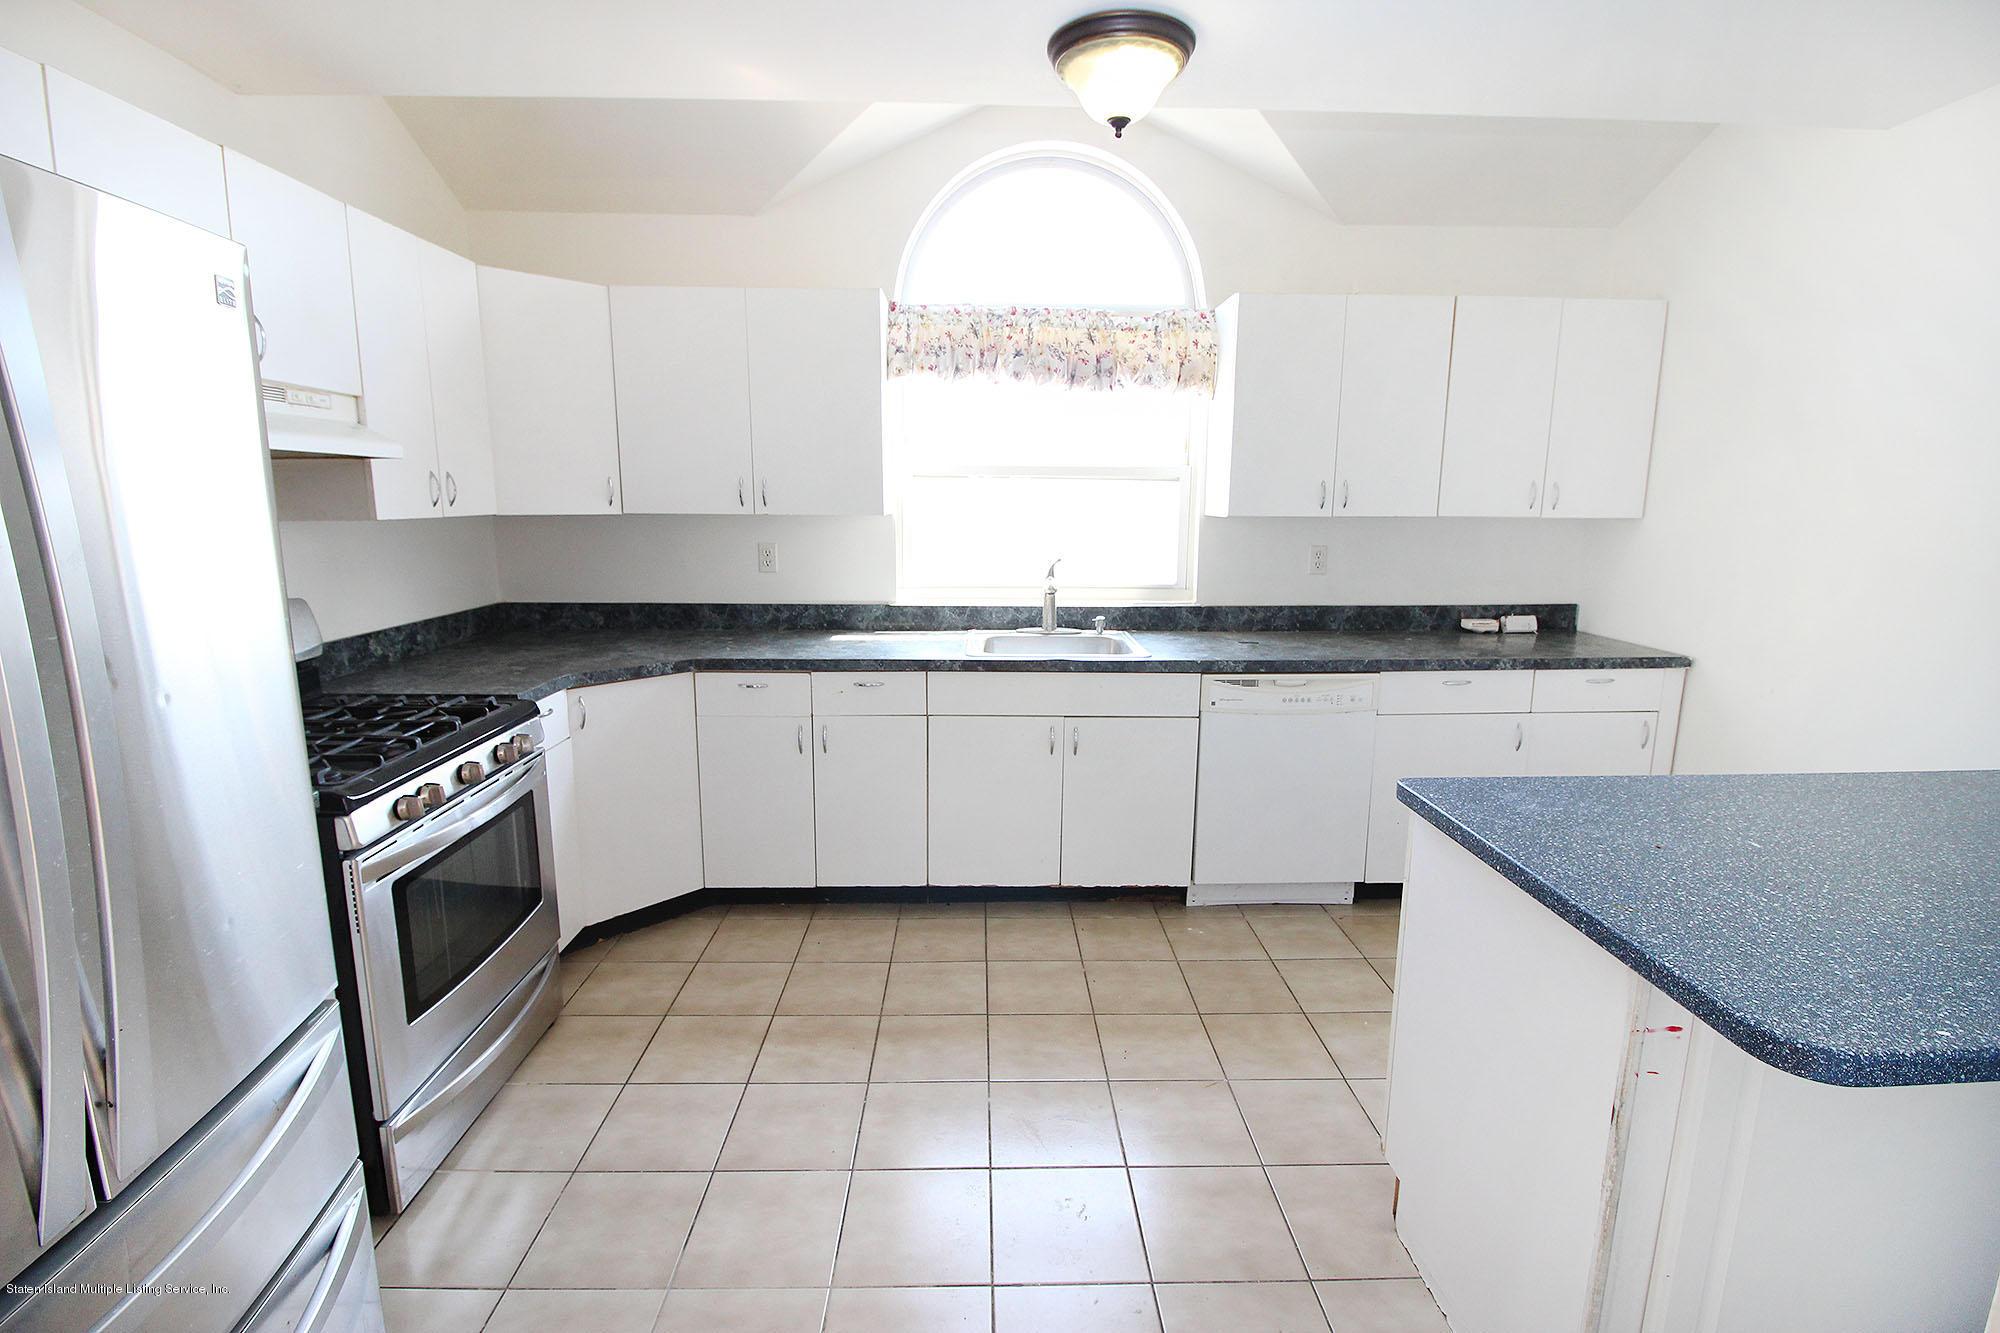 Single Family - Semi-Attached 230 Holden Boulevard  Staten Island, NY 10314, MLS-1139241-5